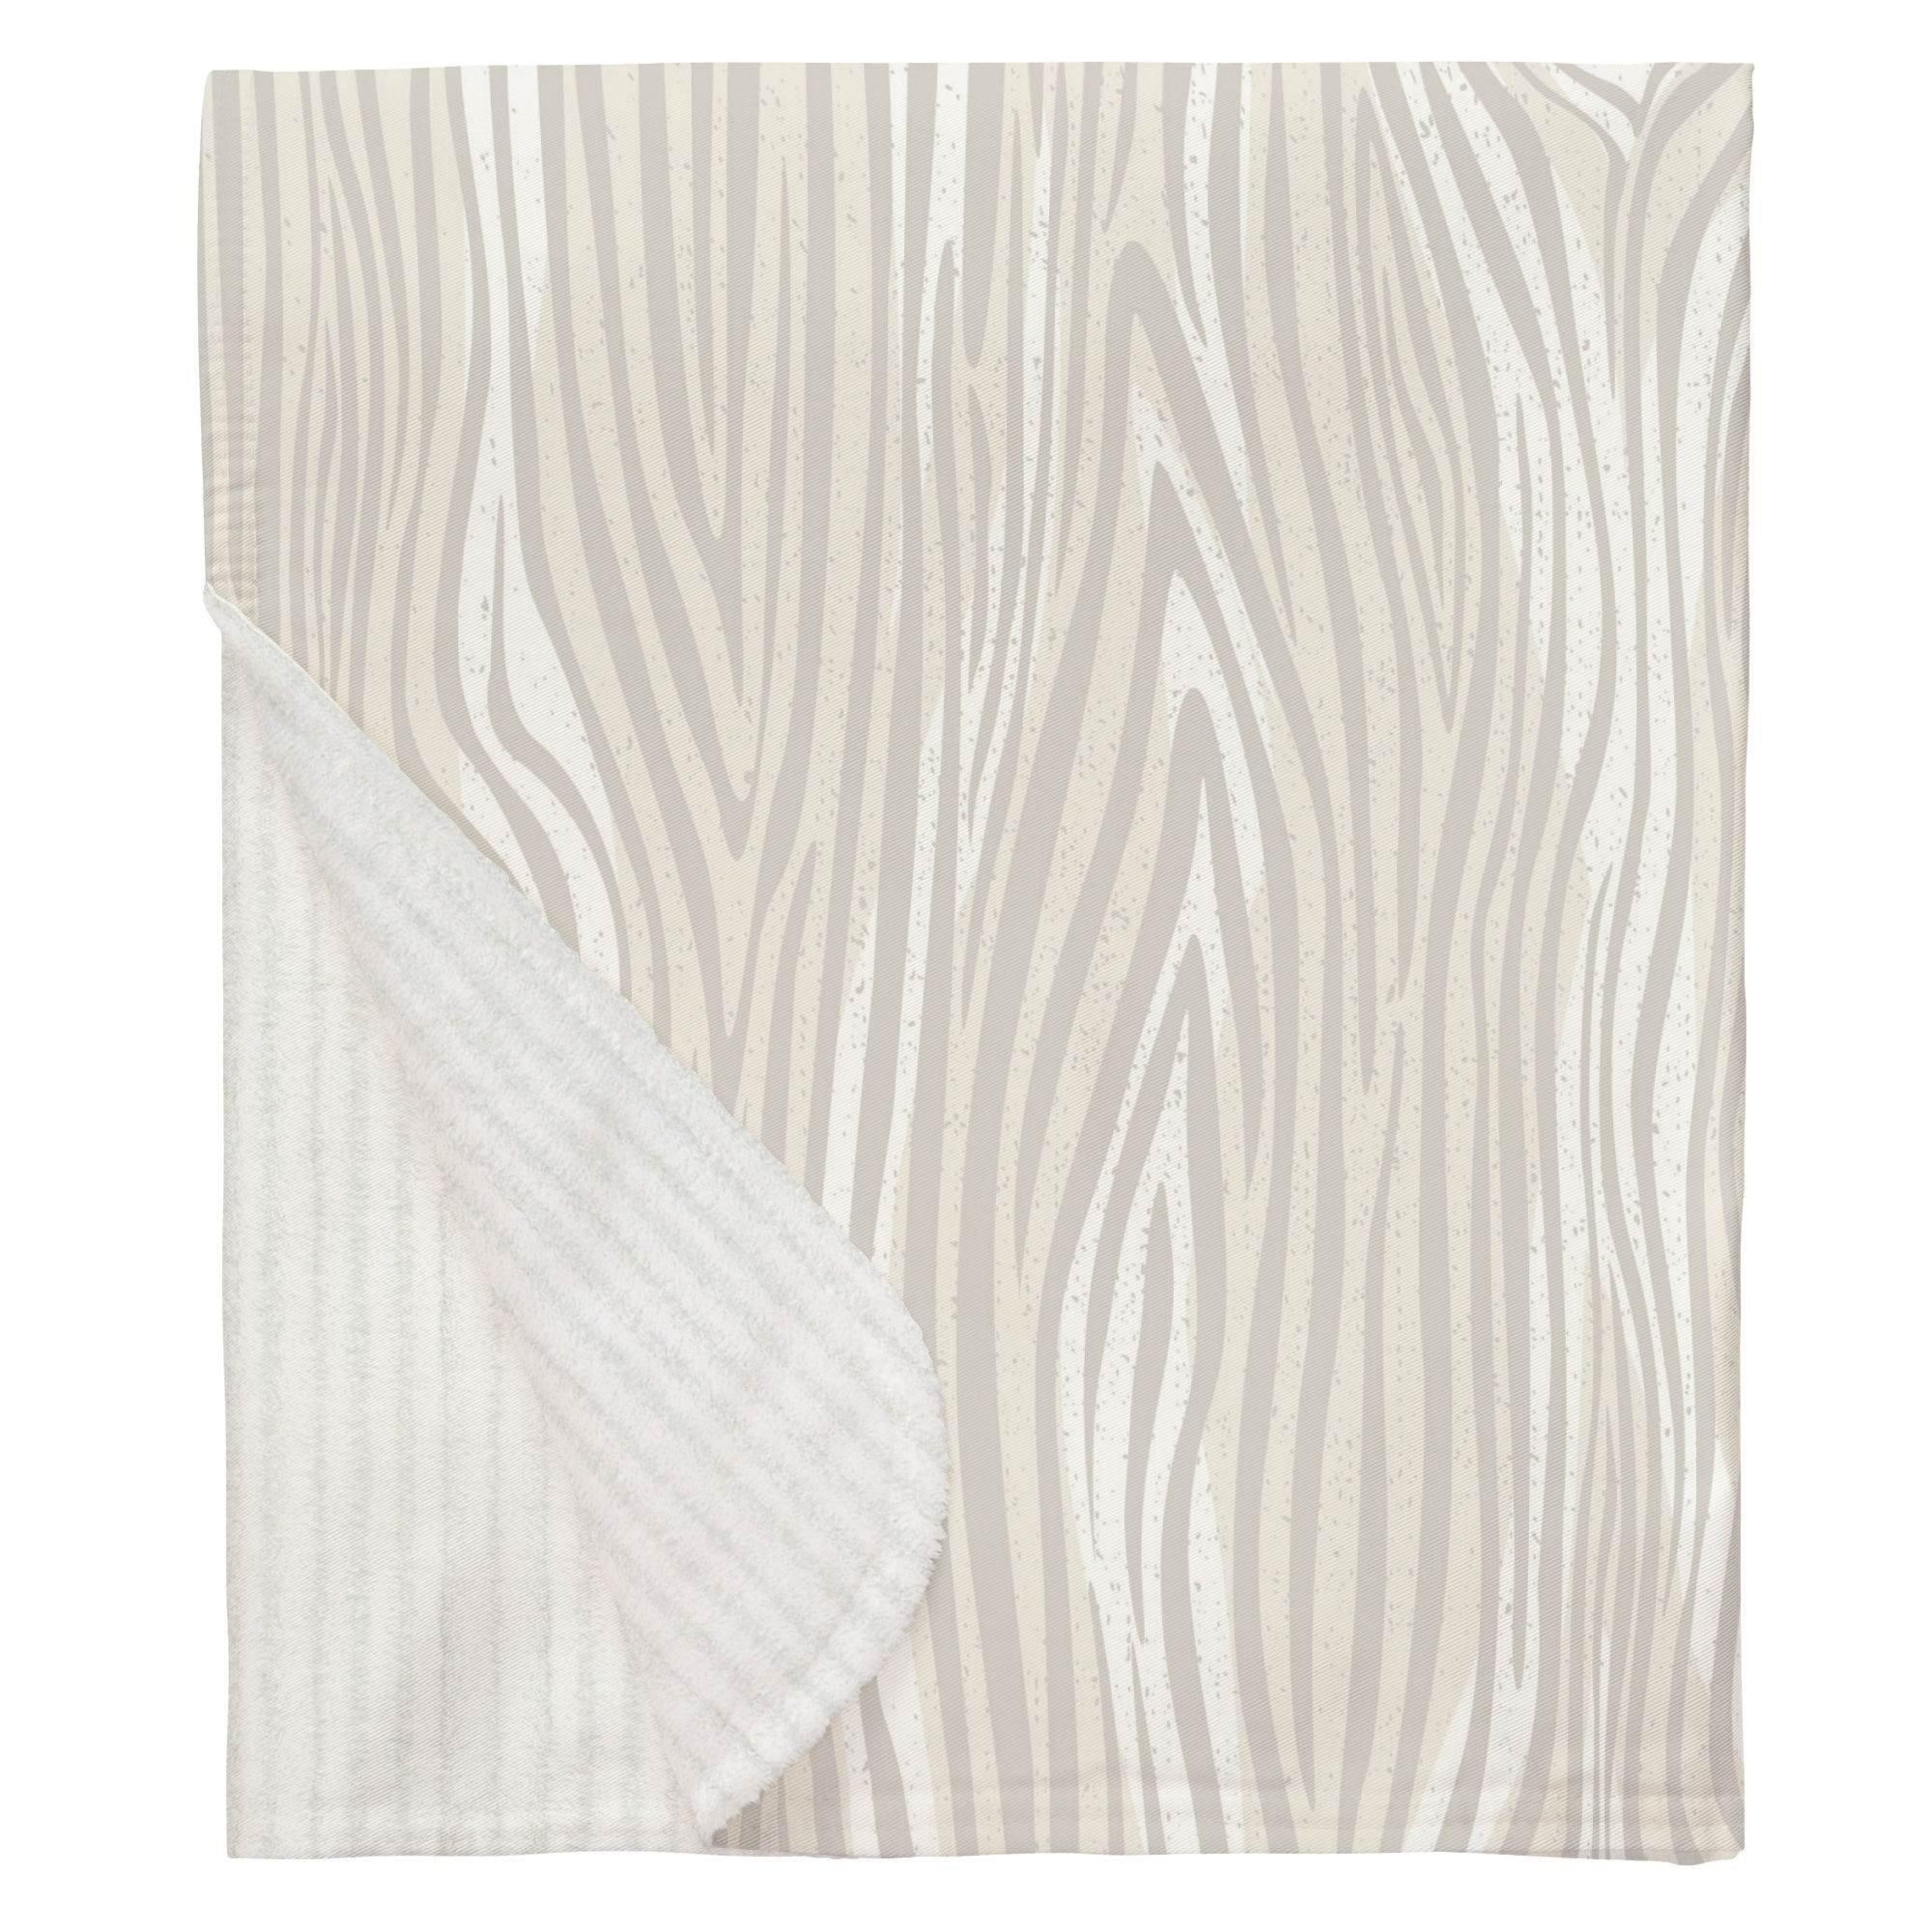 Carousel Designs French Gray Large Woodgrain Mini Crib Blanket by Carousel Designs (Image #1)